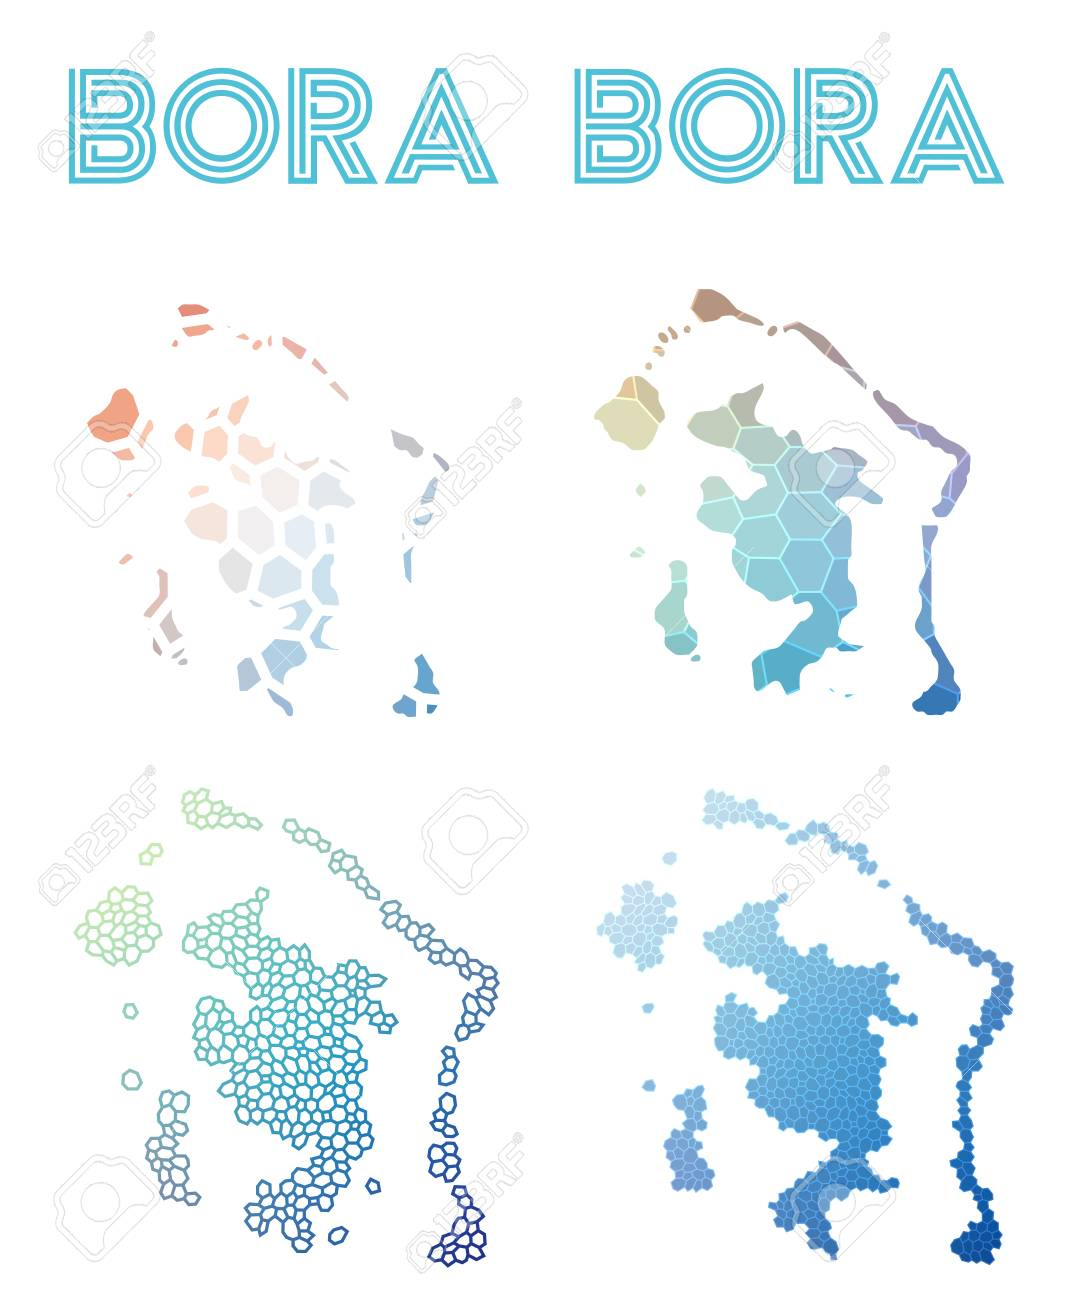 Bora Bora Polygonal Island Map Mosaic Style Maps Collection